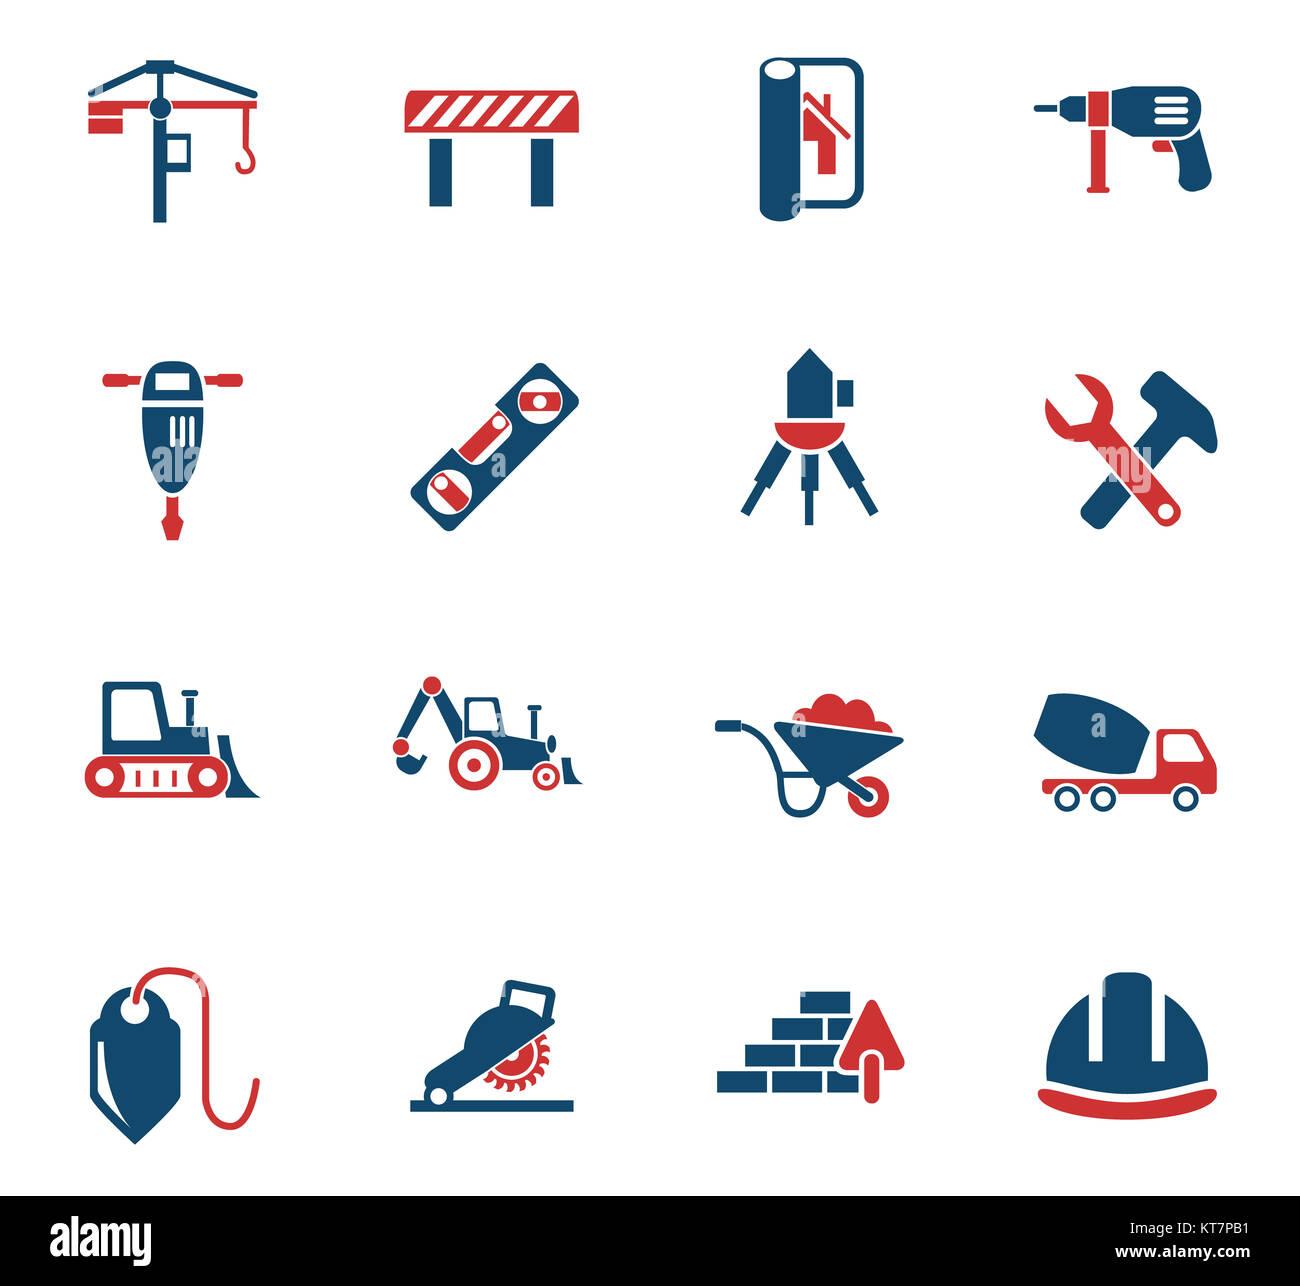 construction icon set - Stock Image